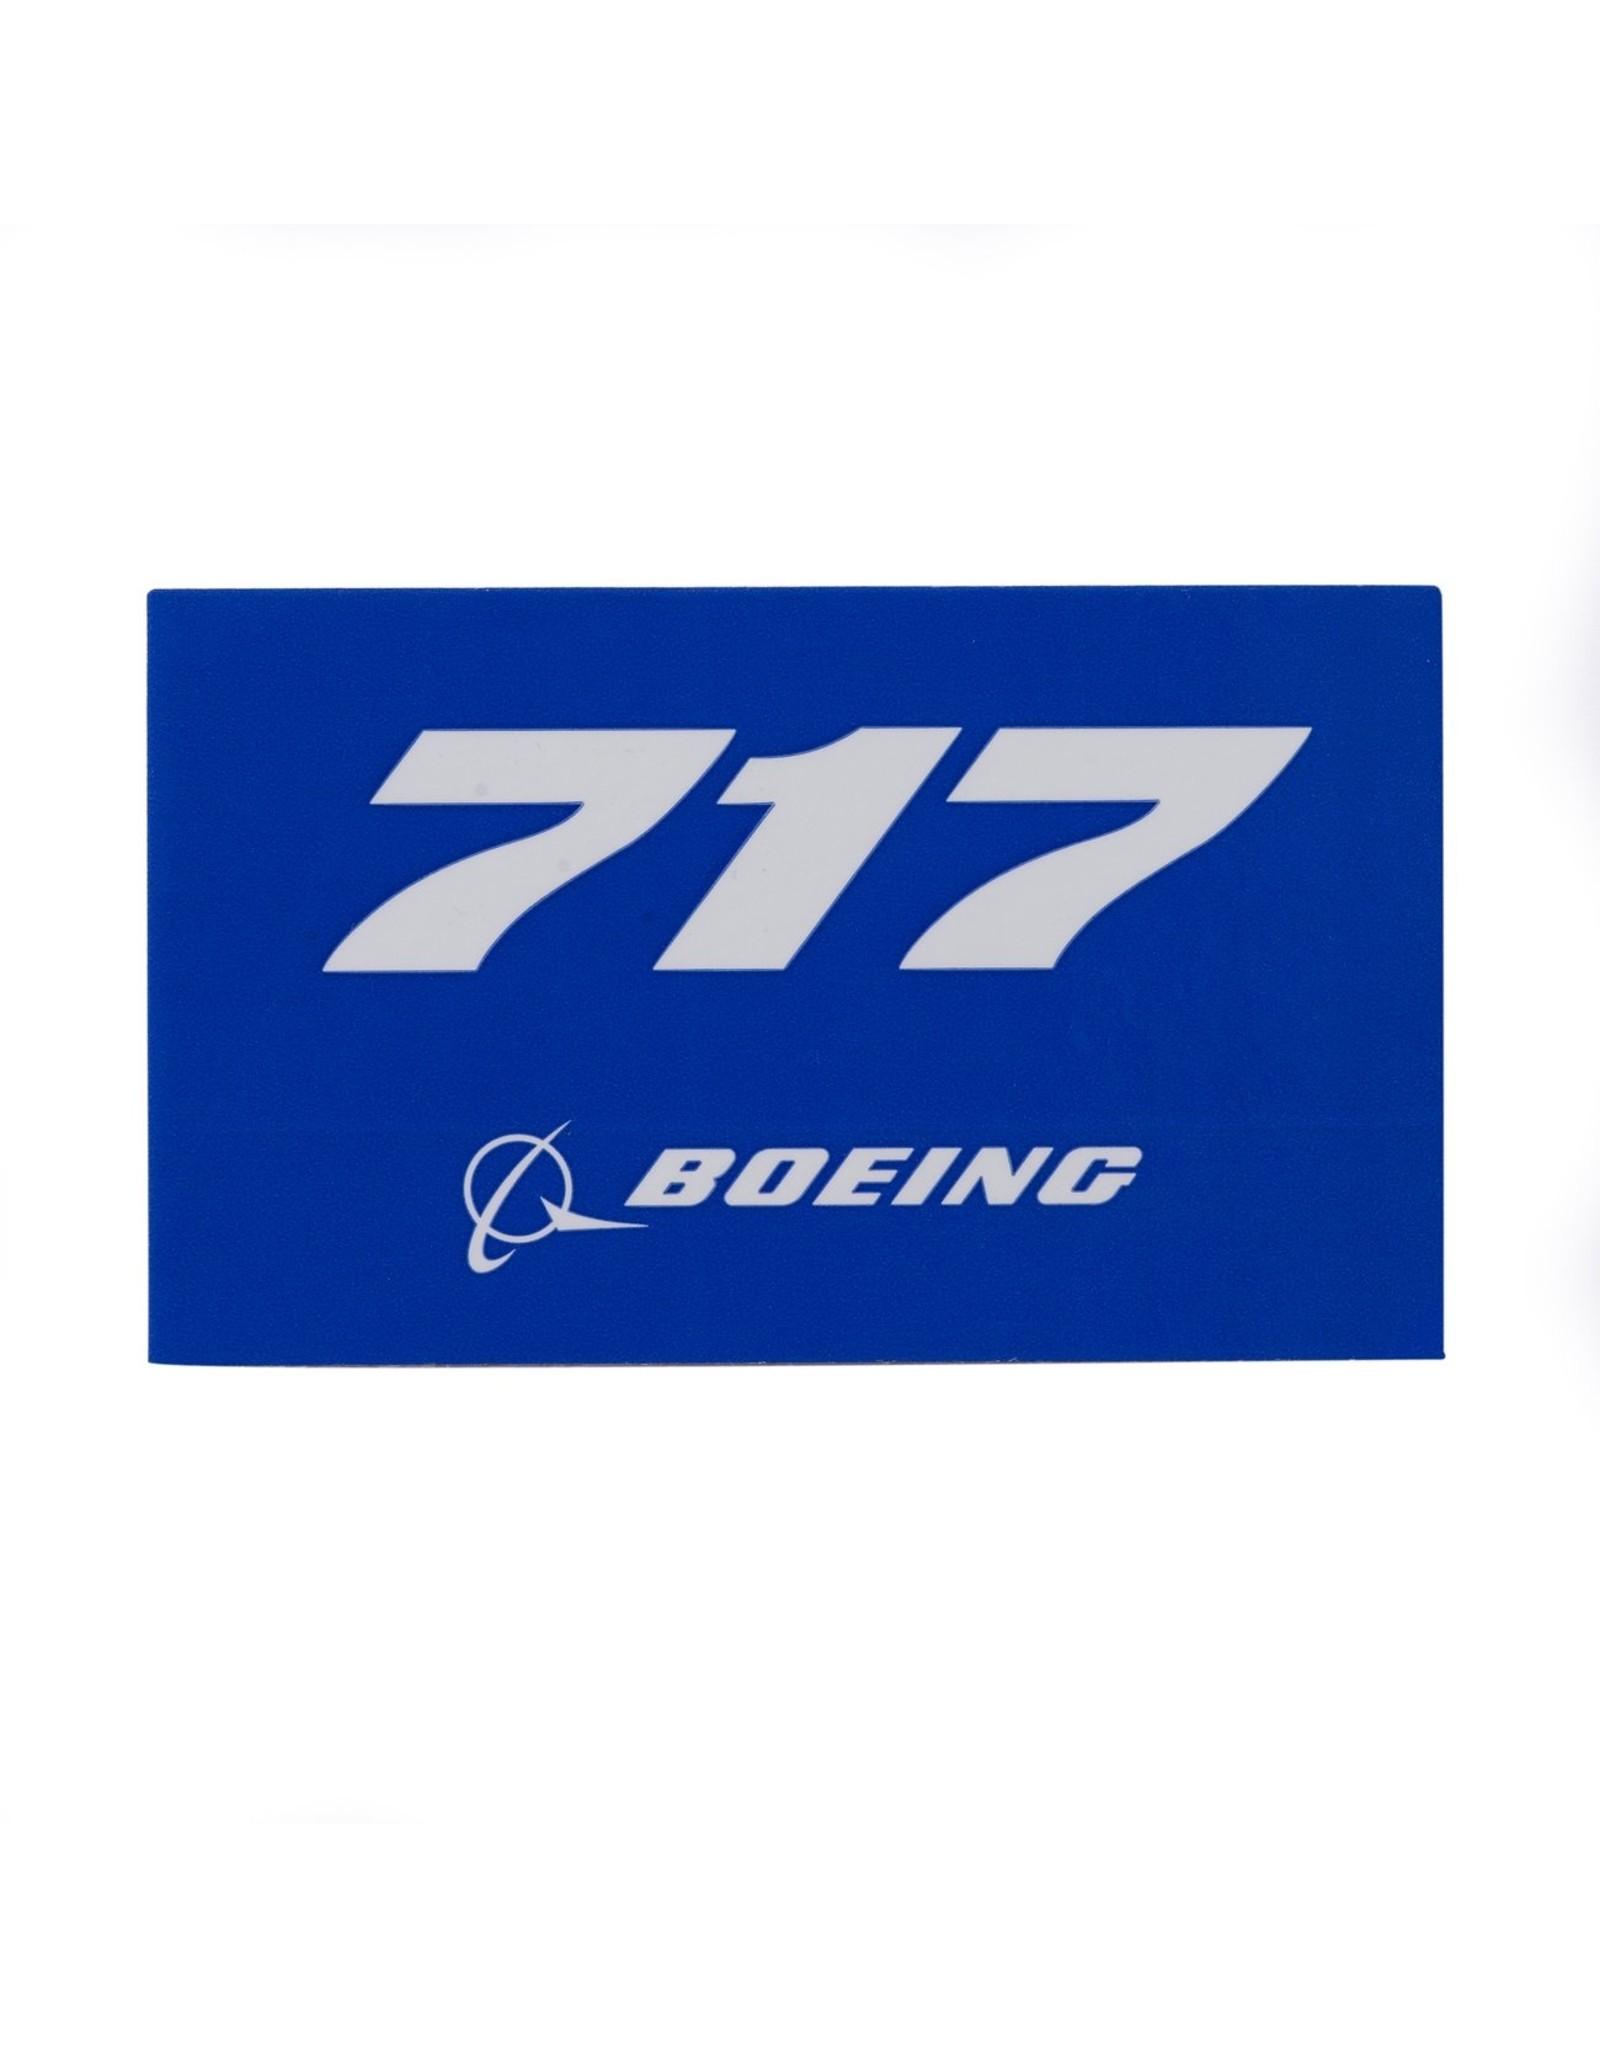 Sticker 717 rectangle